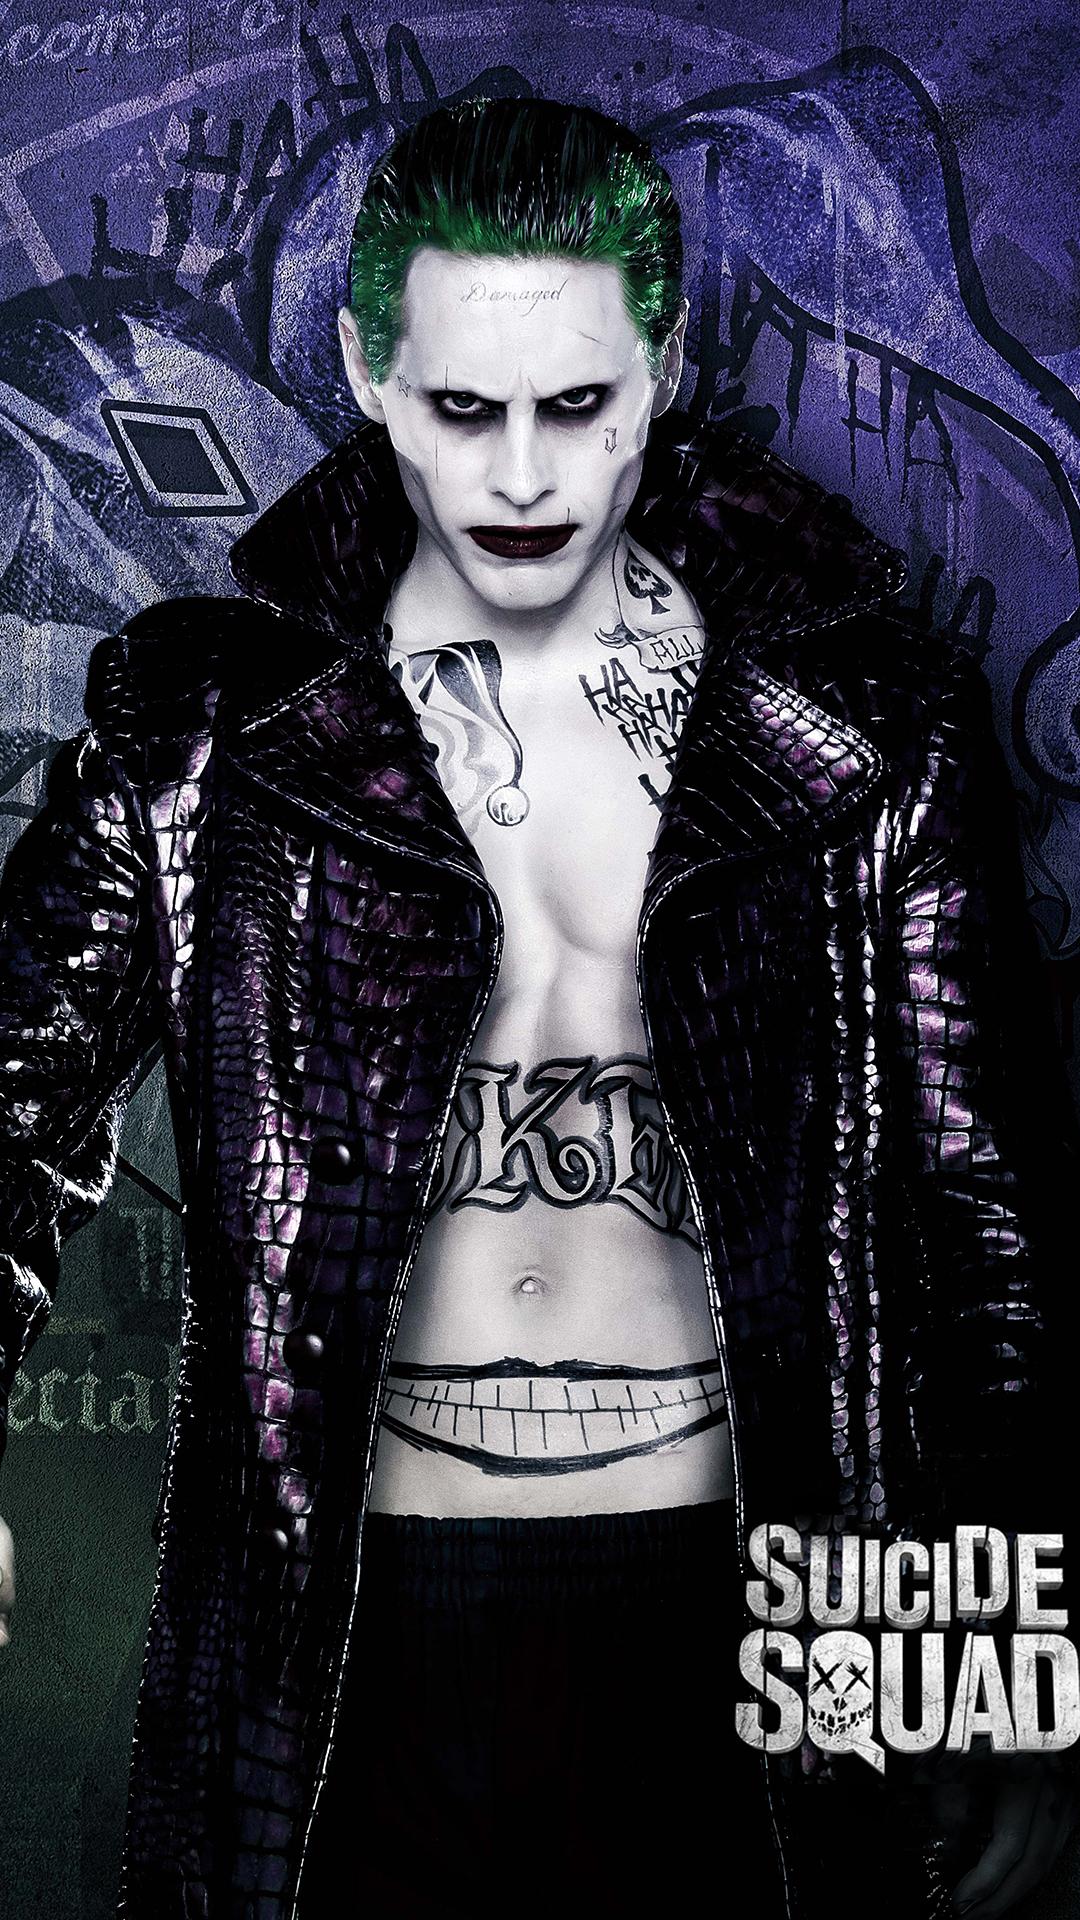 Joker Suicide Squad Iphone Wallpaper Hd